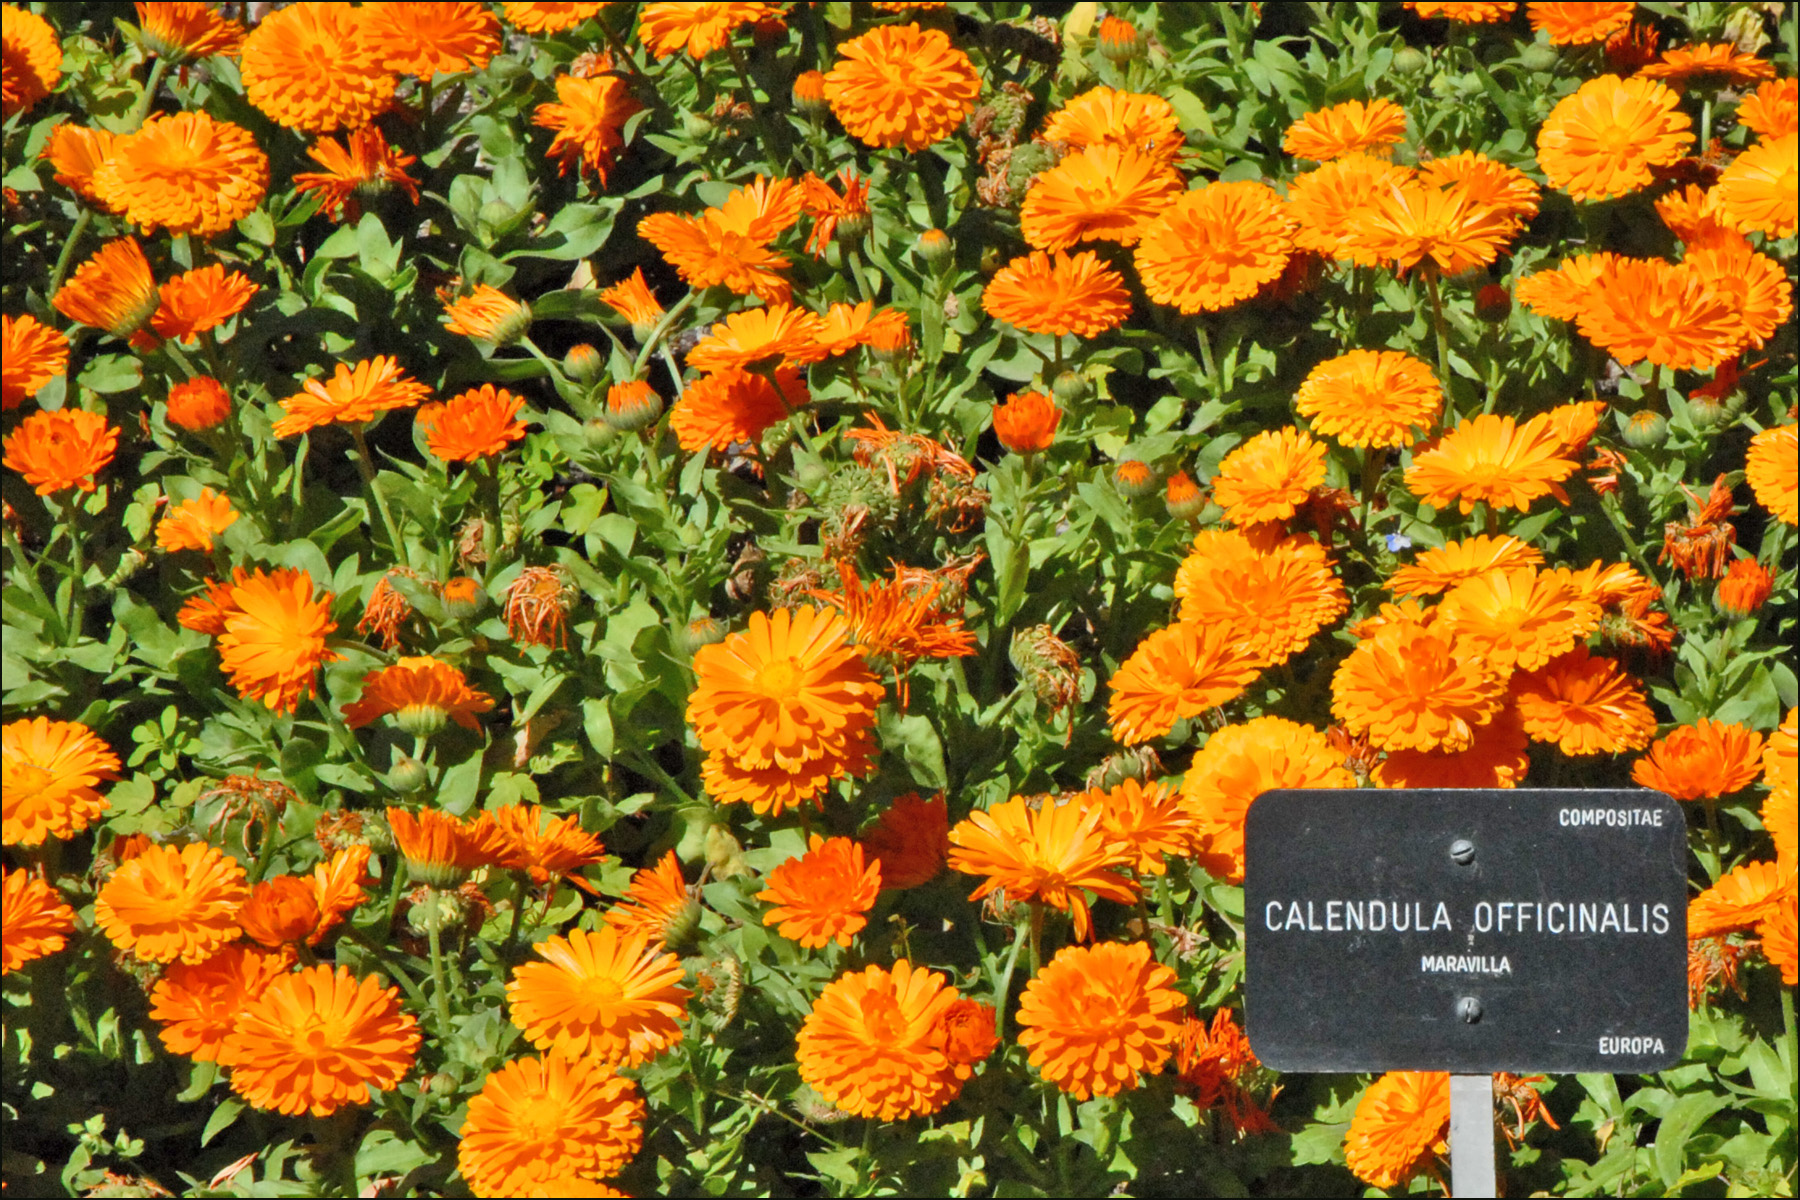 file calendula officinalis real jardin botanico madrid 4657015473 jpg wikimedia commons. Black Bedroom Furniture Sets. Home Design Ideas